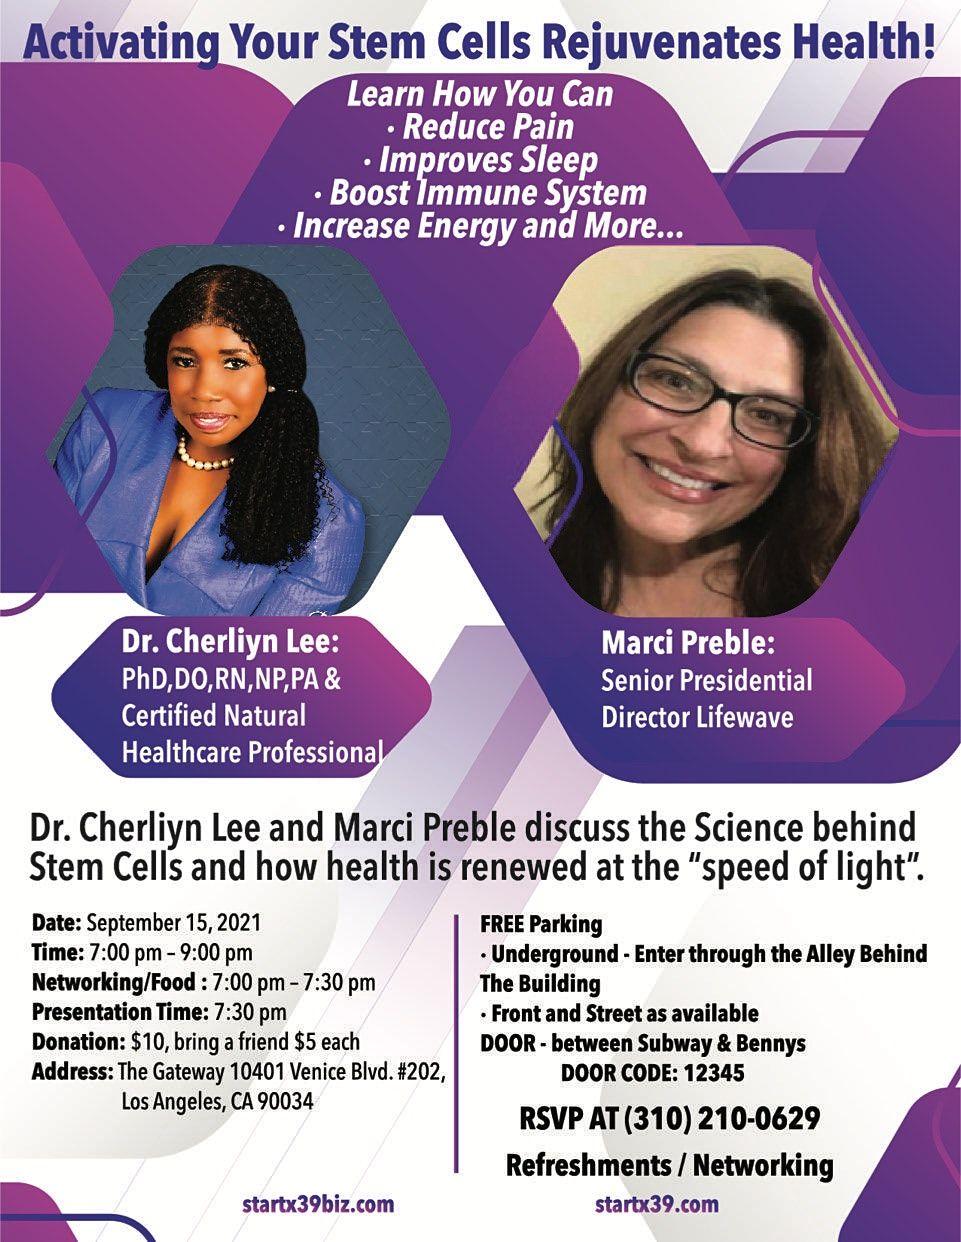 Stem Cell Activation Awaits You! Can Stem Cells Rejuvenate Health?